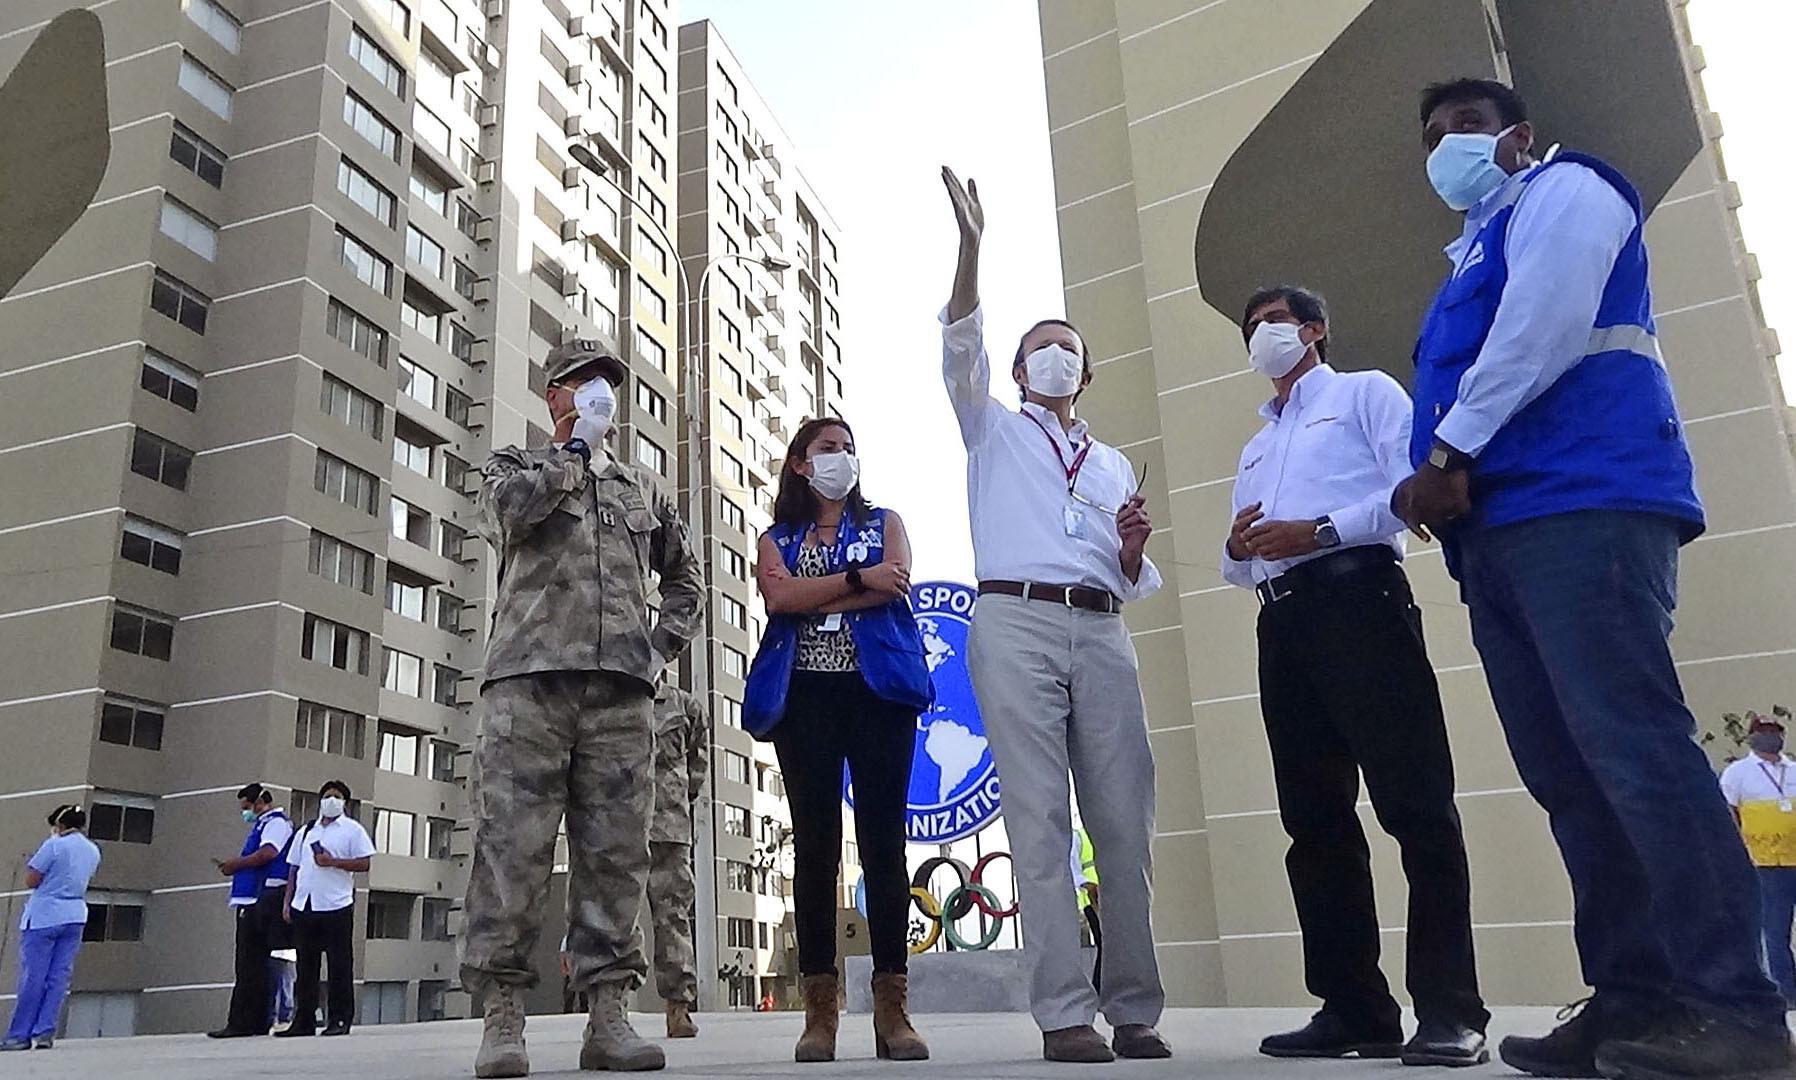 Lima 2019 Athletes' Village among sporting venues to become coronavirus medical facilities